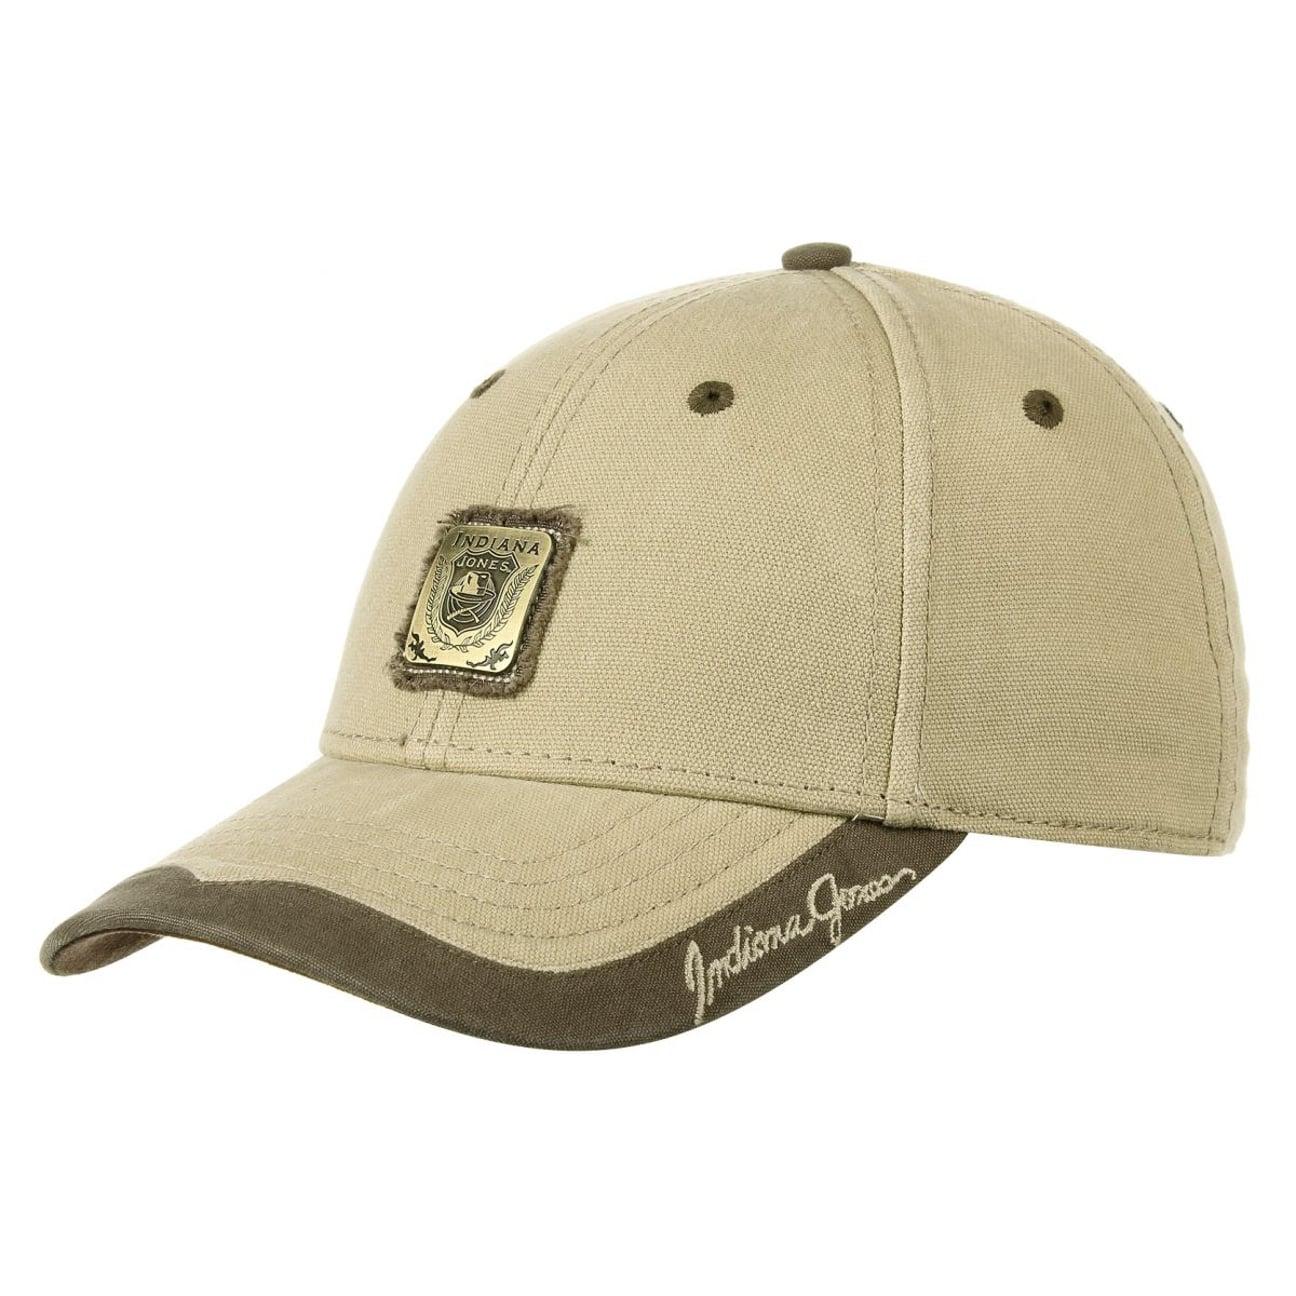 64e3d3e9919fa ... Indiana Jones Baseball Cap - black 1 ...